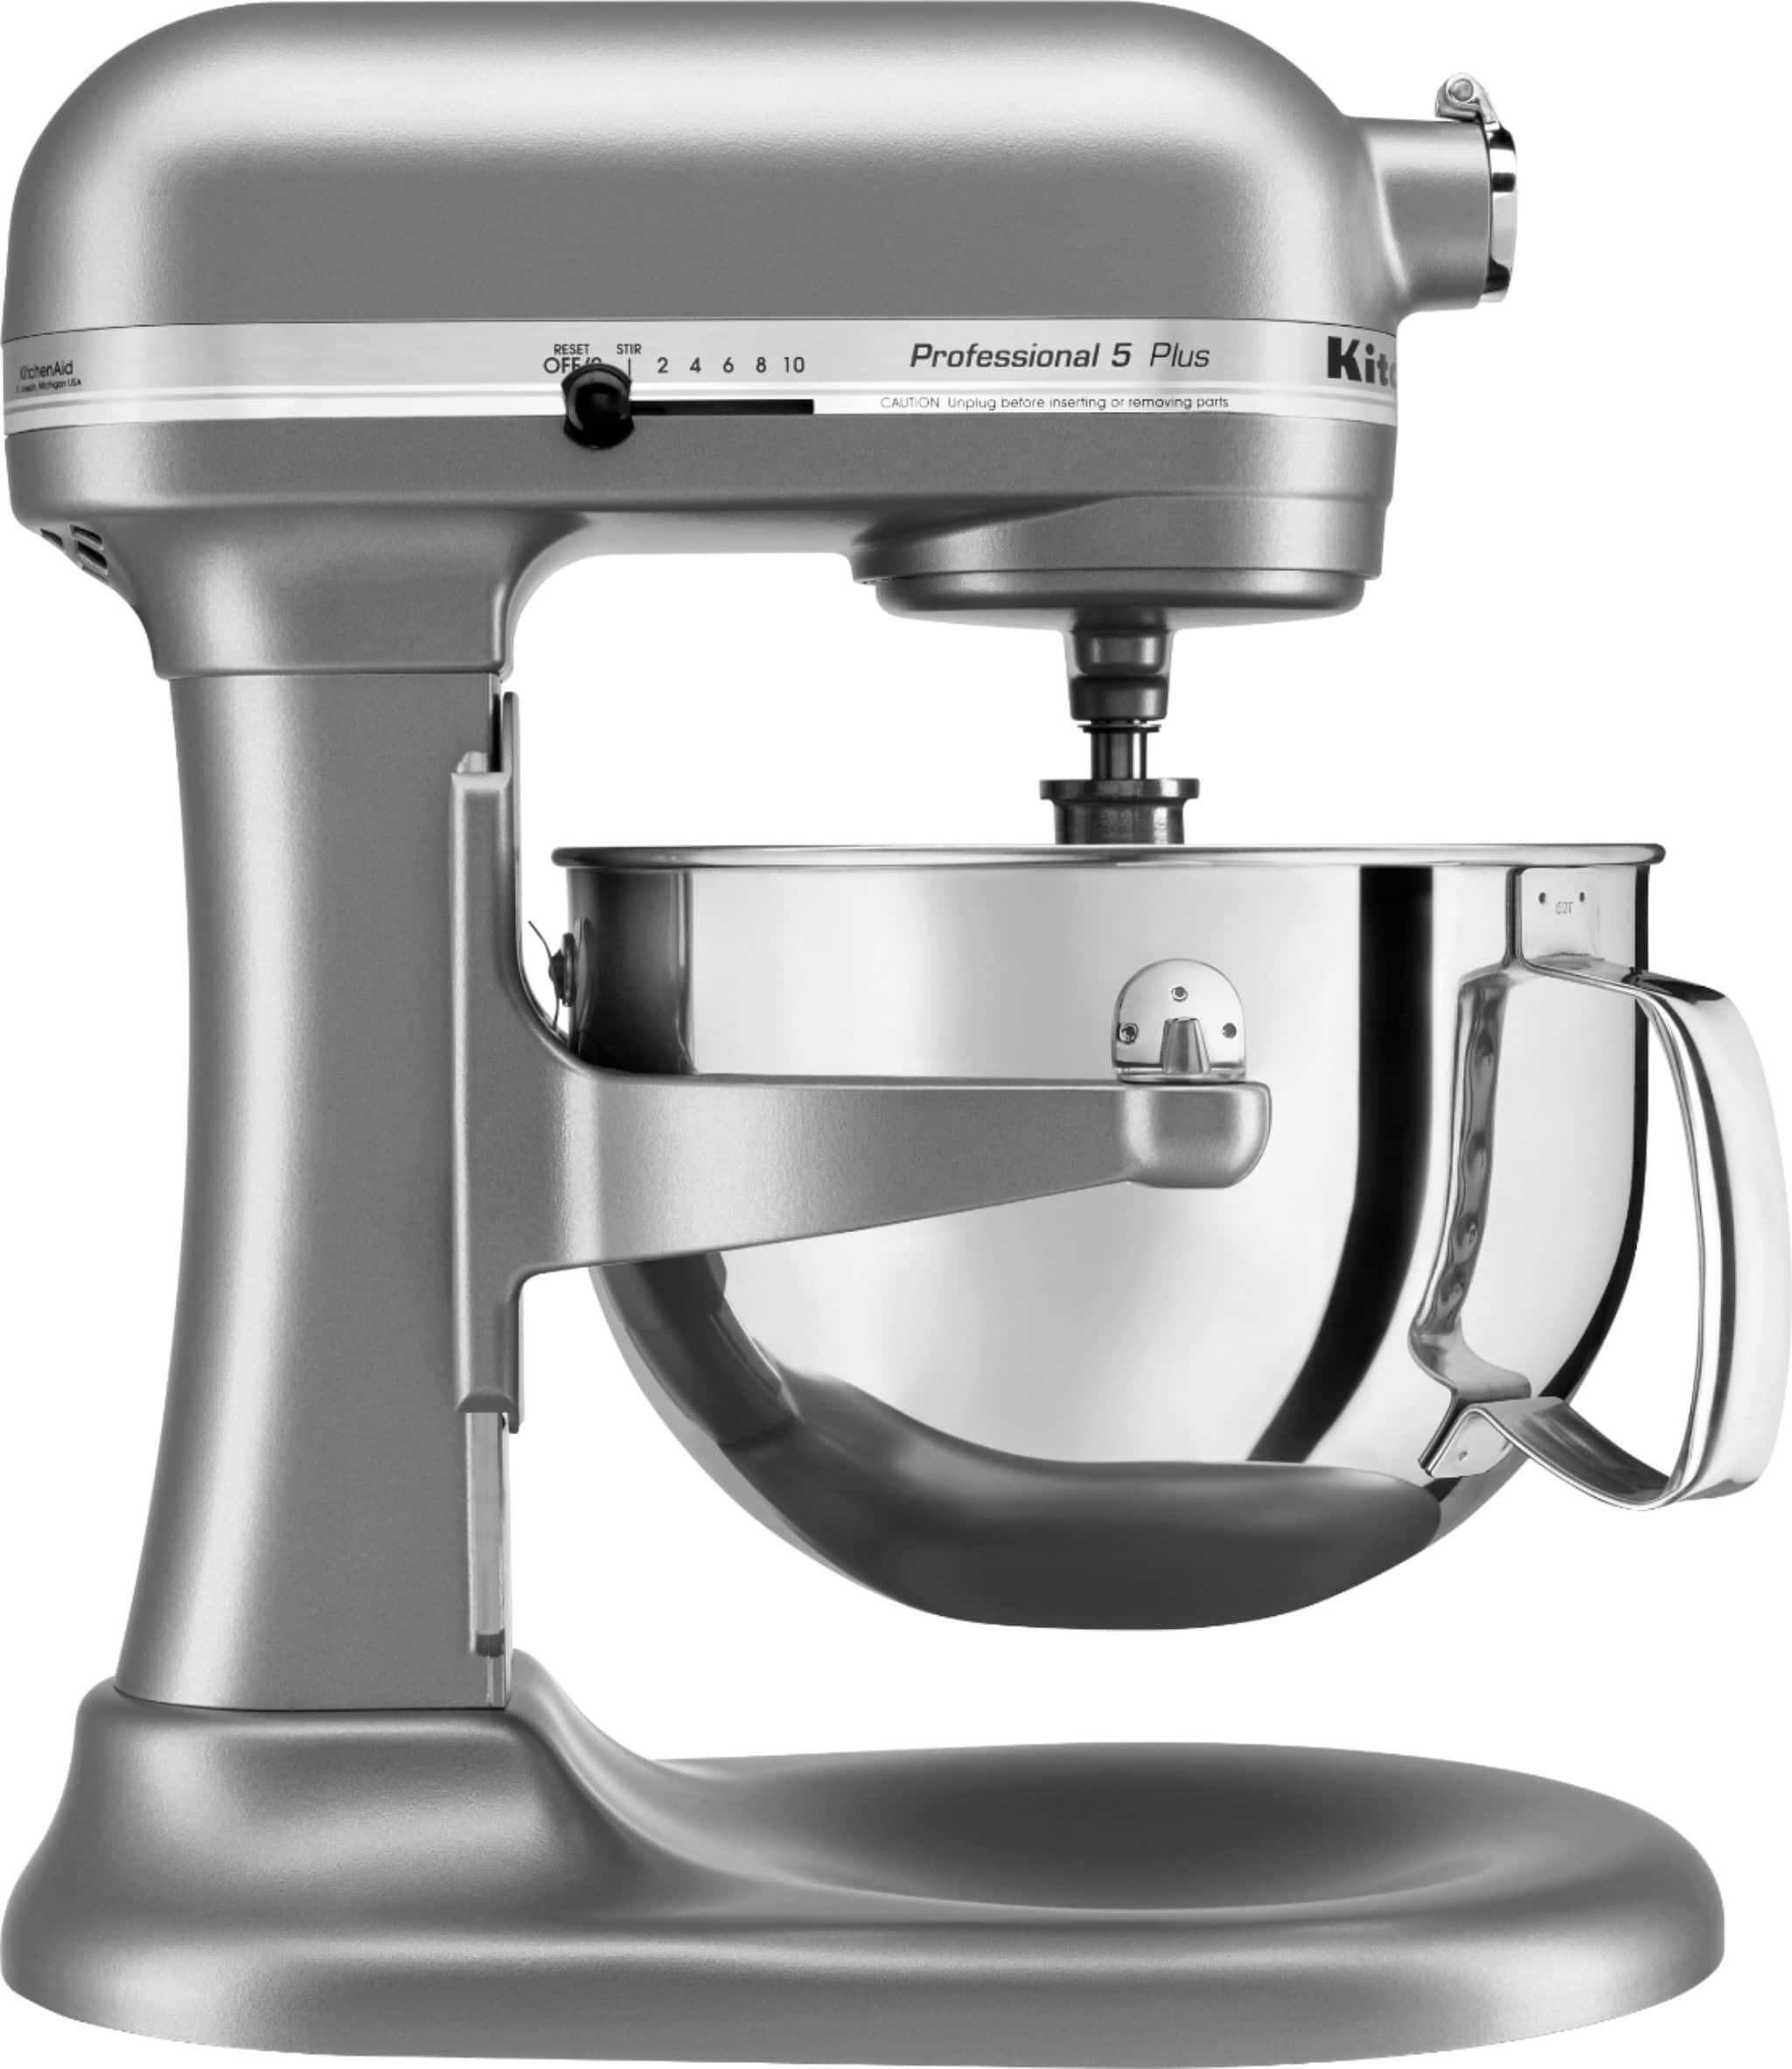 Kitchenaid Professional 5 Plus Series 5-Quart Bowl-Lift Stand Mixer